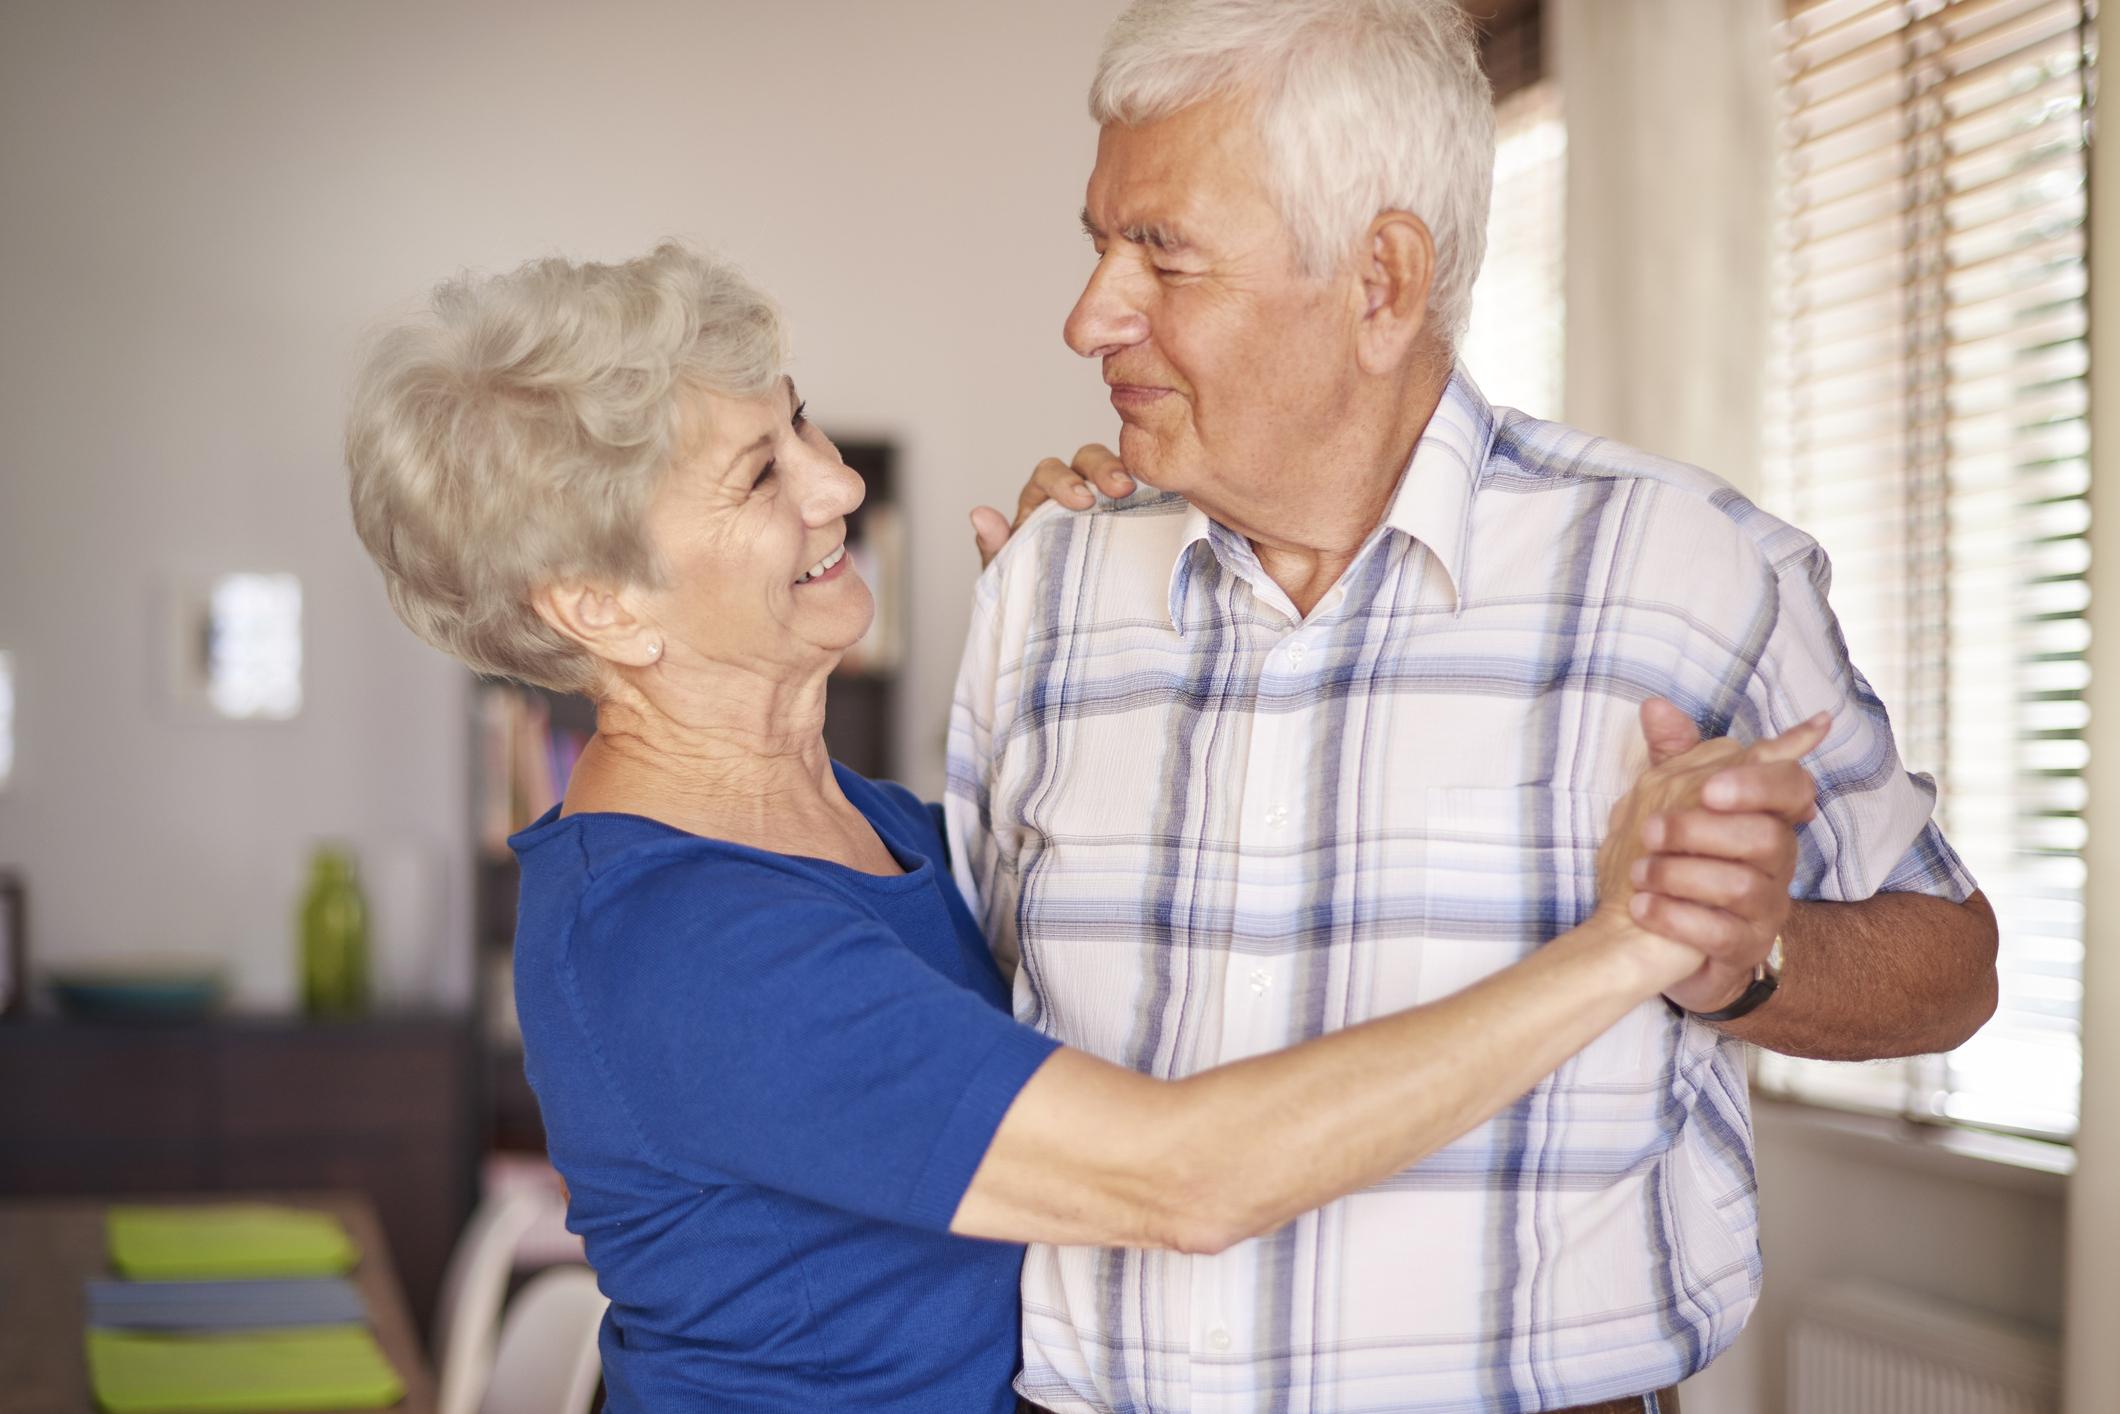 Generic photo of elderly couple dancing (Thinkstock/PA)